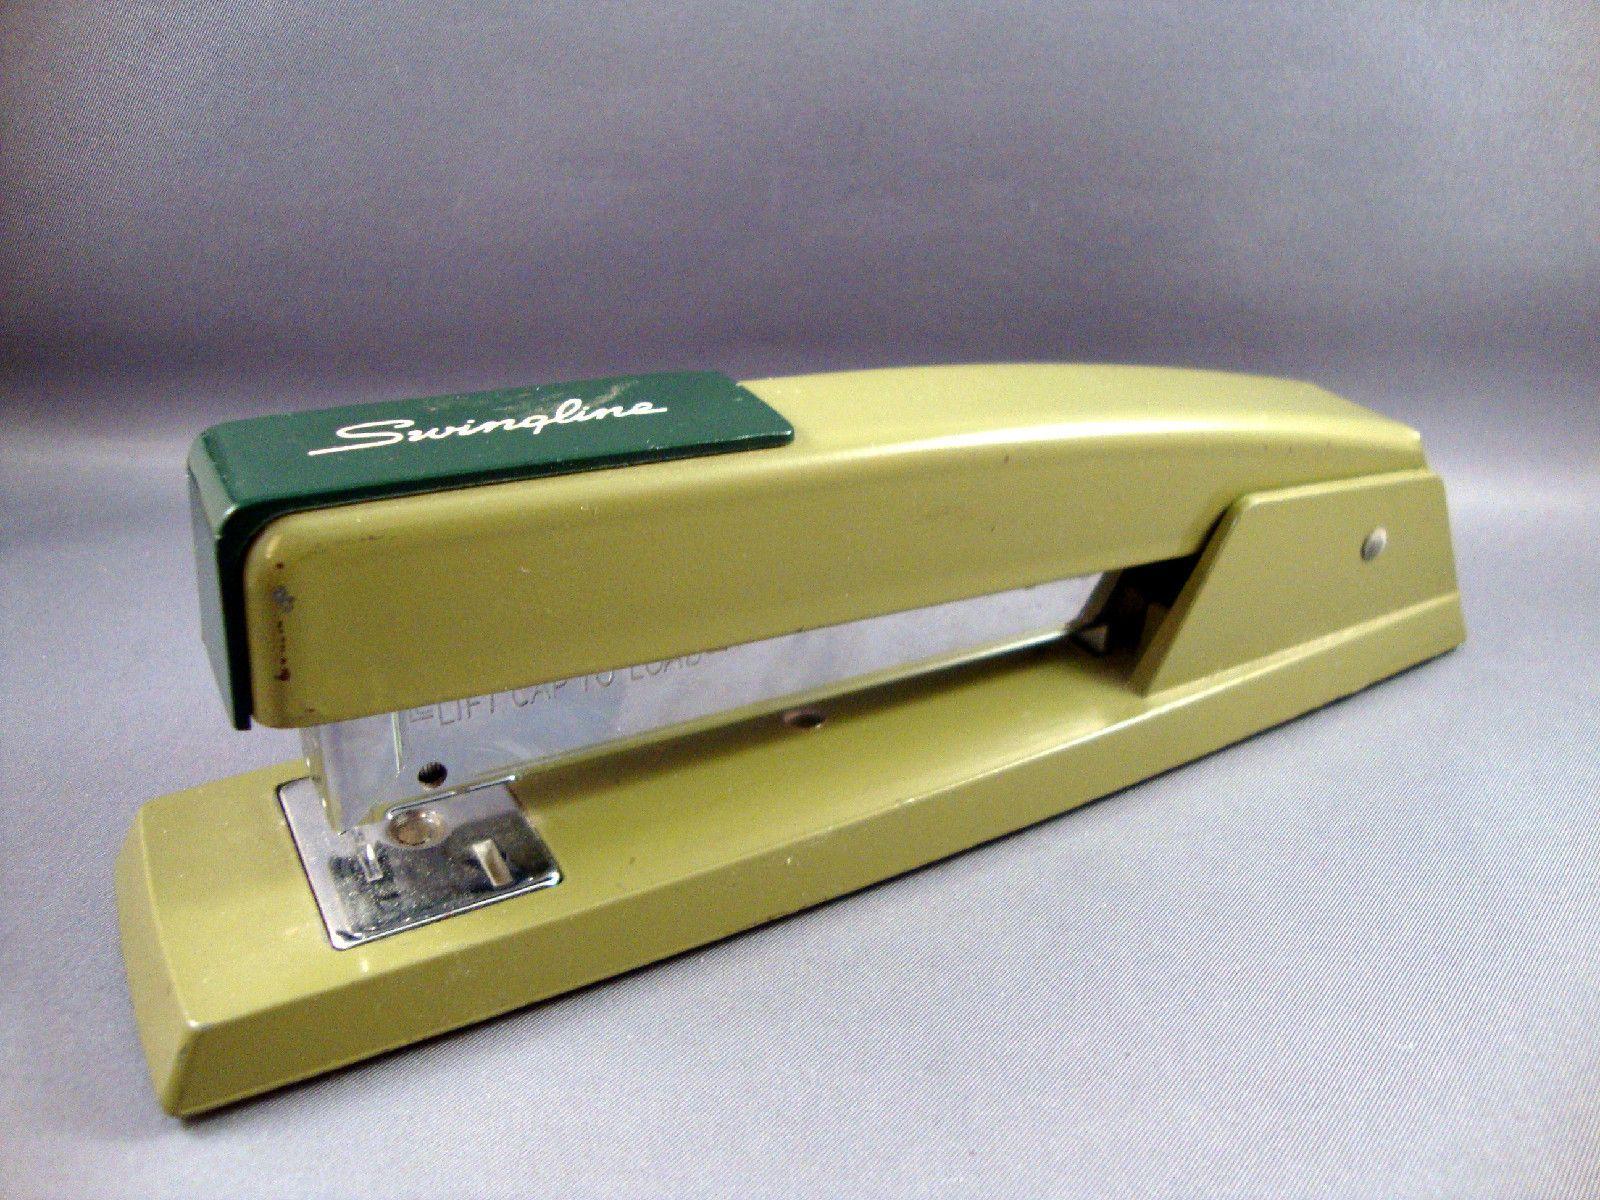 Vintage swingline stapler fluke 414d distance measuring laser